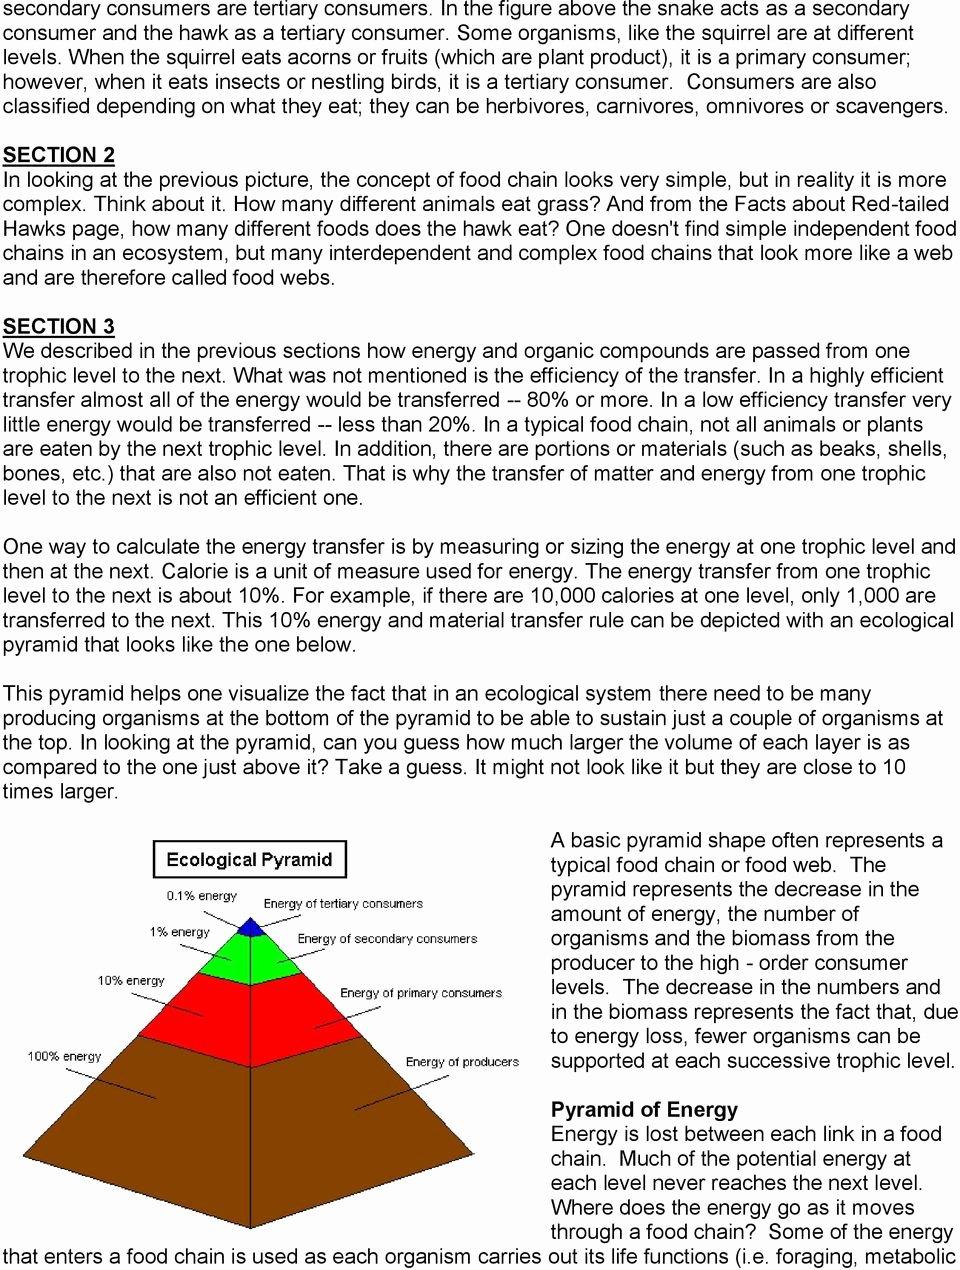 Ecological Pyramids Worksheet Answer Key New Food Chains Food Webs and Ecological Pyramids Pdf Free